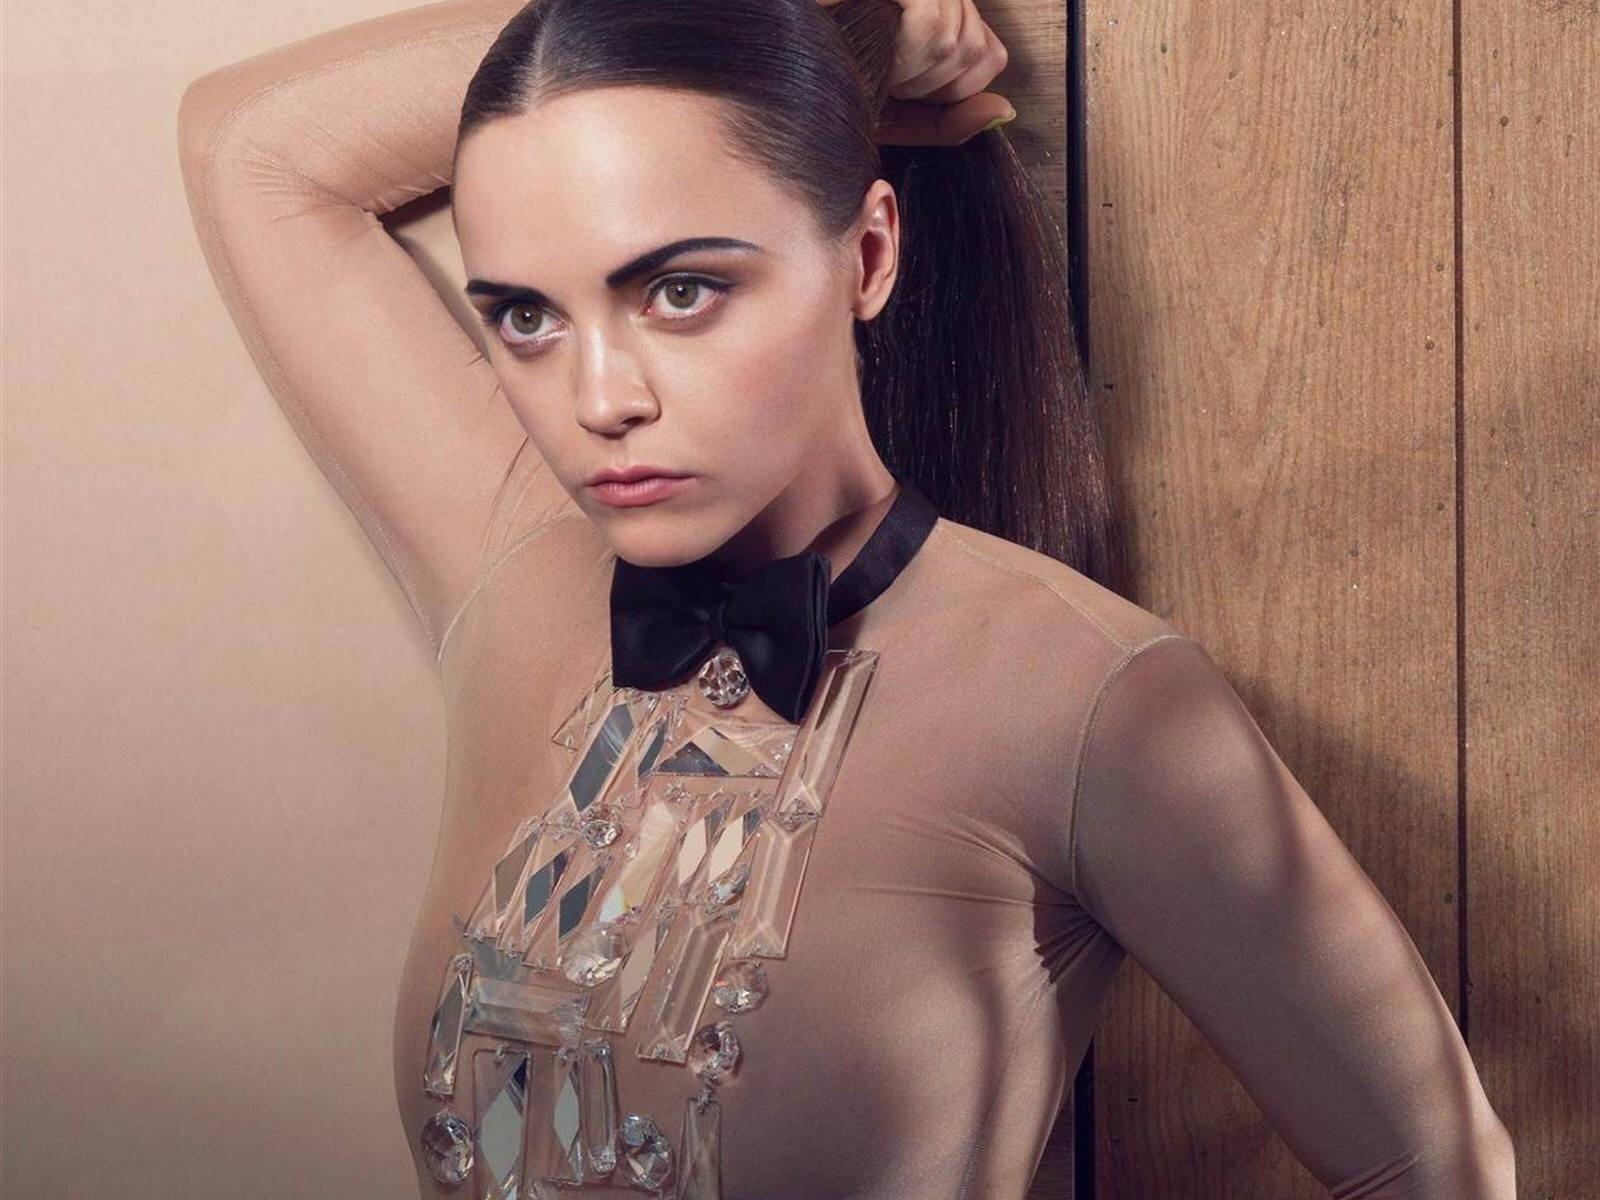 Christina Ricci Hot Actress Wallpaper Blip Fun Online 1600x1200